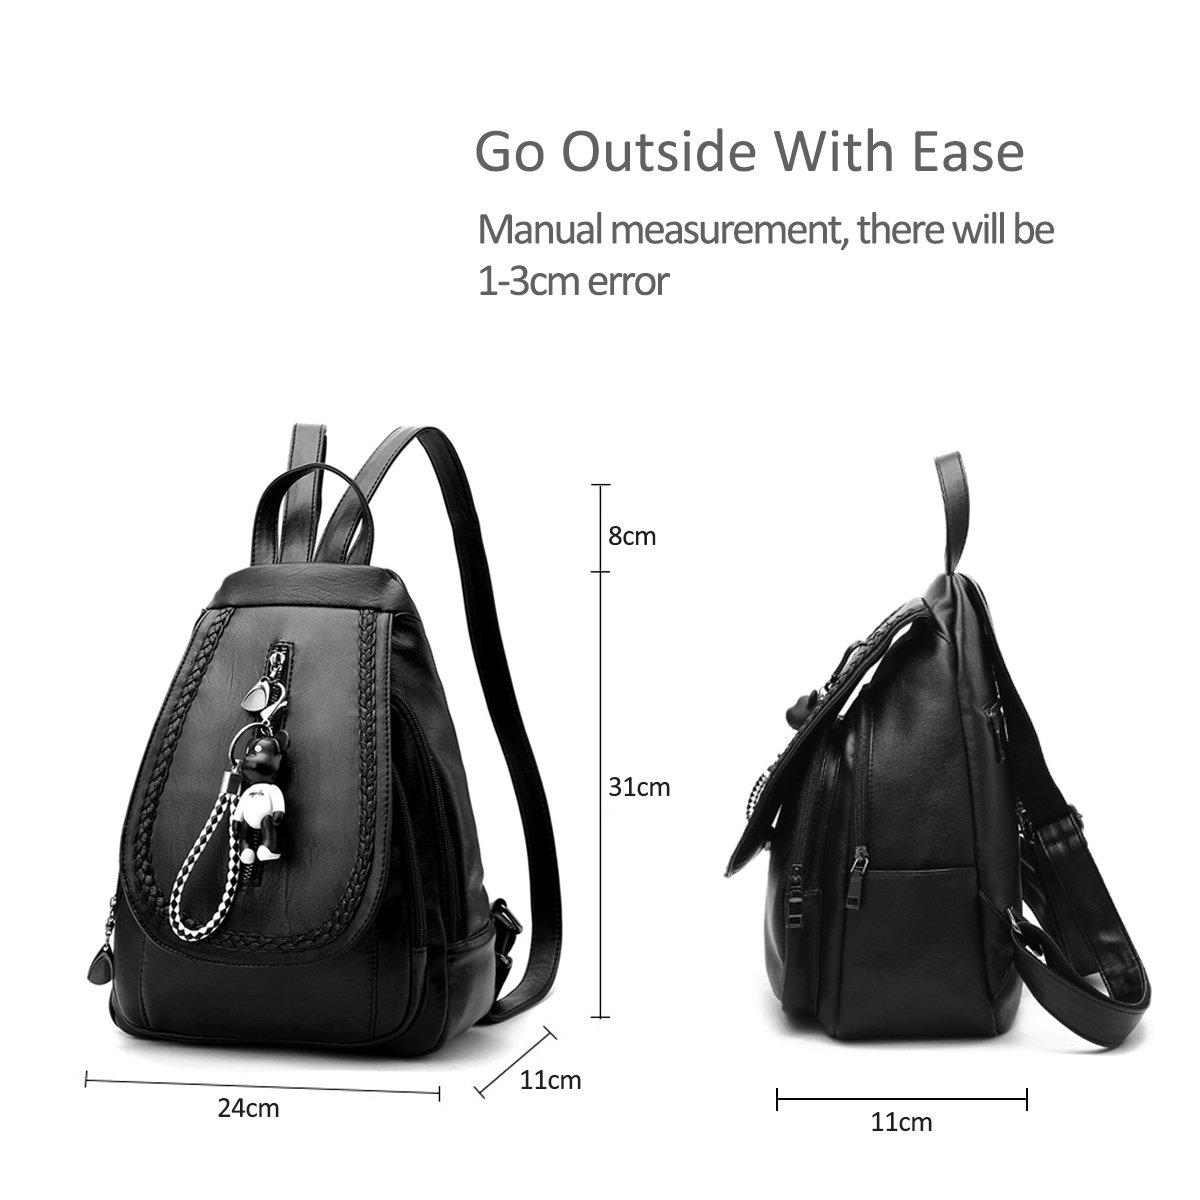 Amazon.com   NICOLE&DORIS Classic Fashion Schoolbag Travel Backpack Women Shoulder Bag Daypack Satchel Girls PU Leather Black   Backpacks